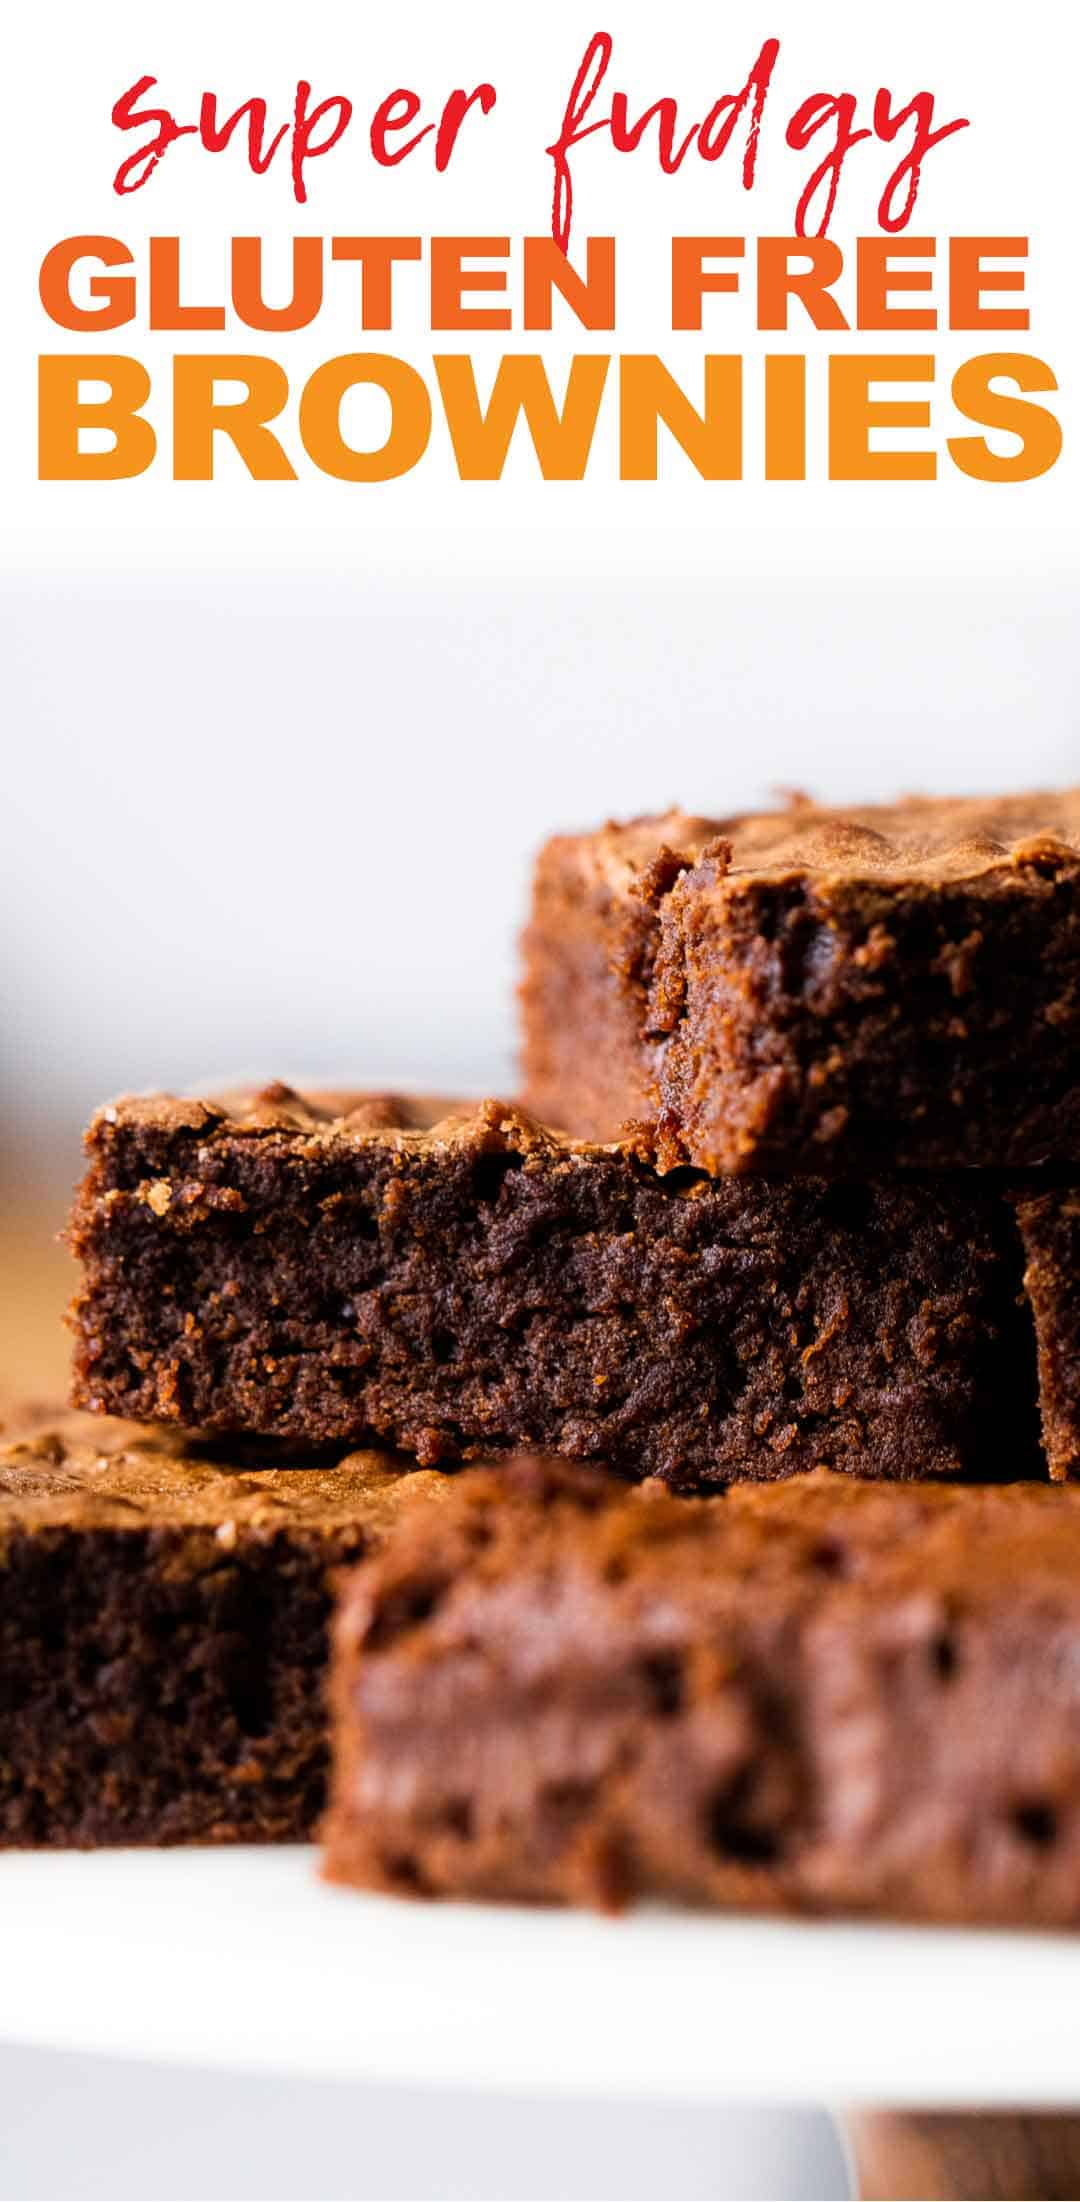 Chickpea Flour Brownies (Easy, Gluten Free, Fudgy)